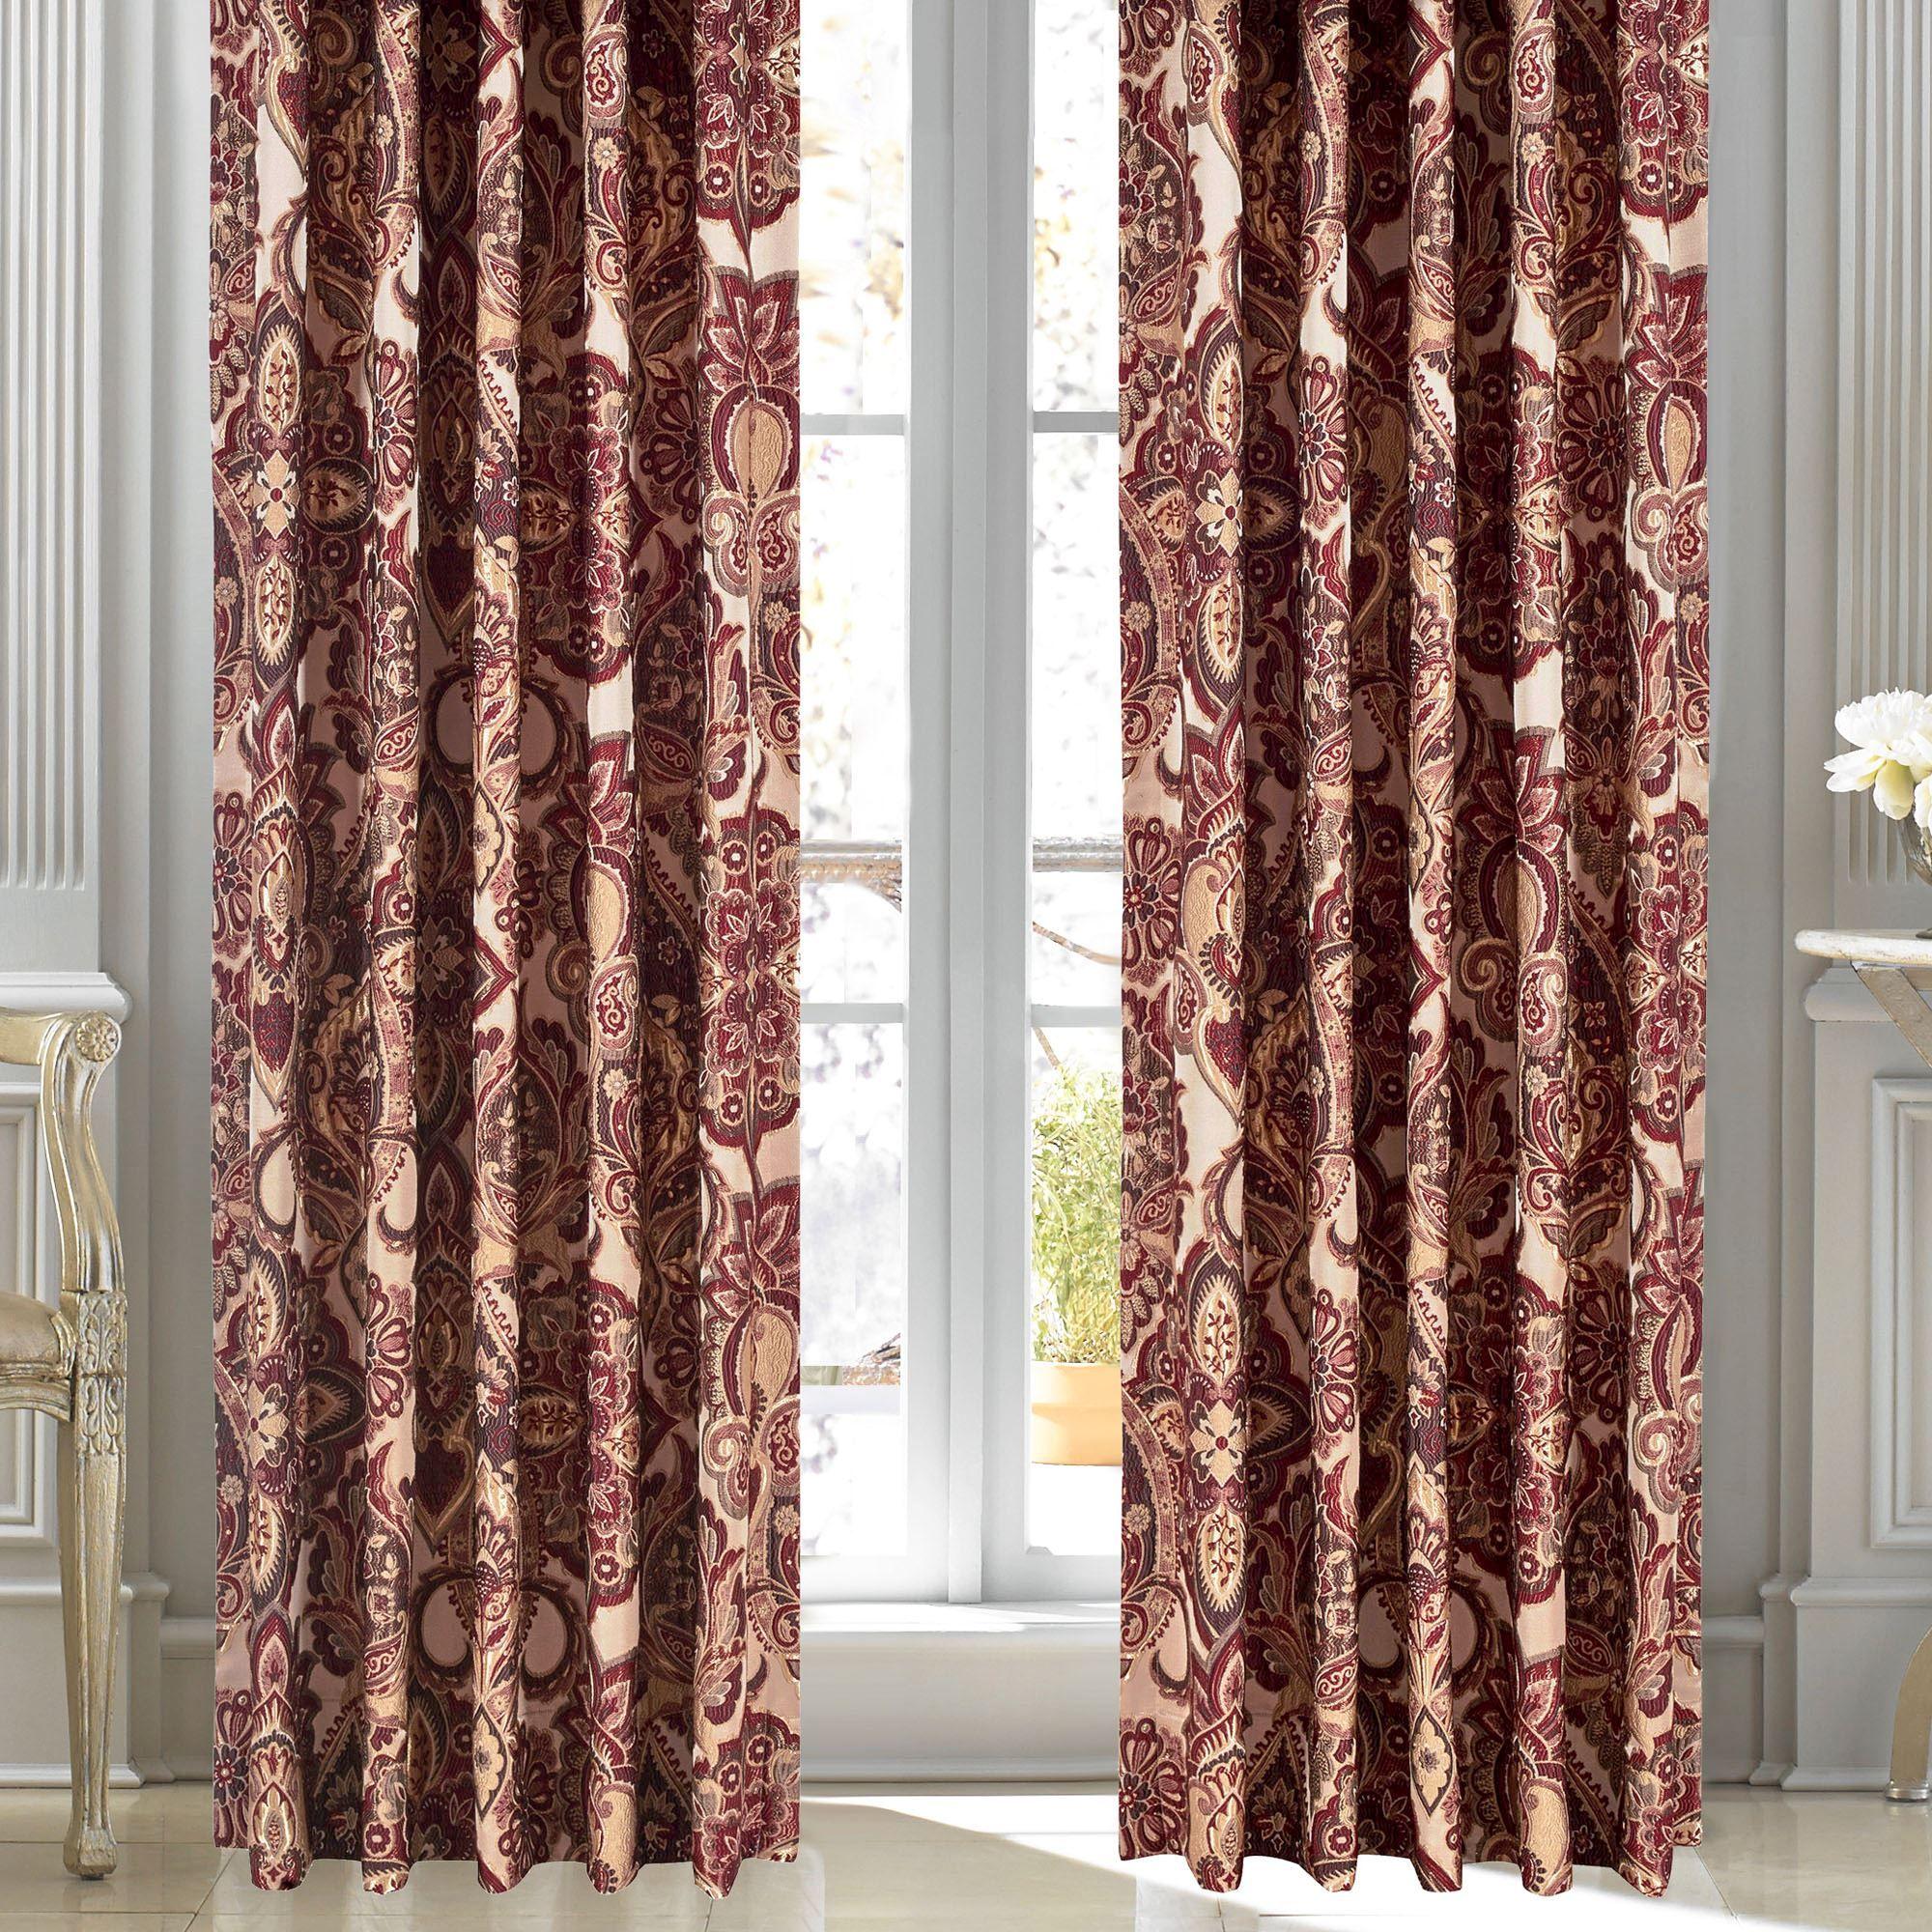 dillards shower new permalink greeniteconomicsummit york l j image org curtains queen